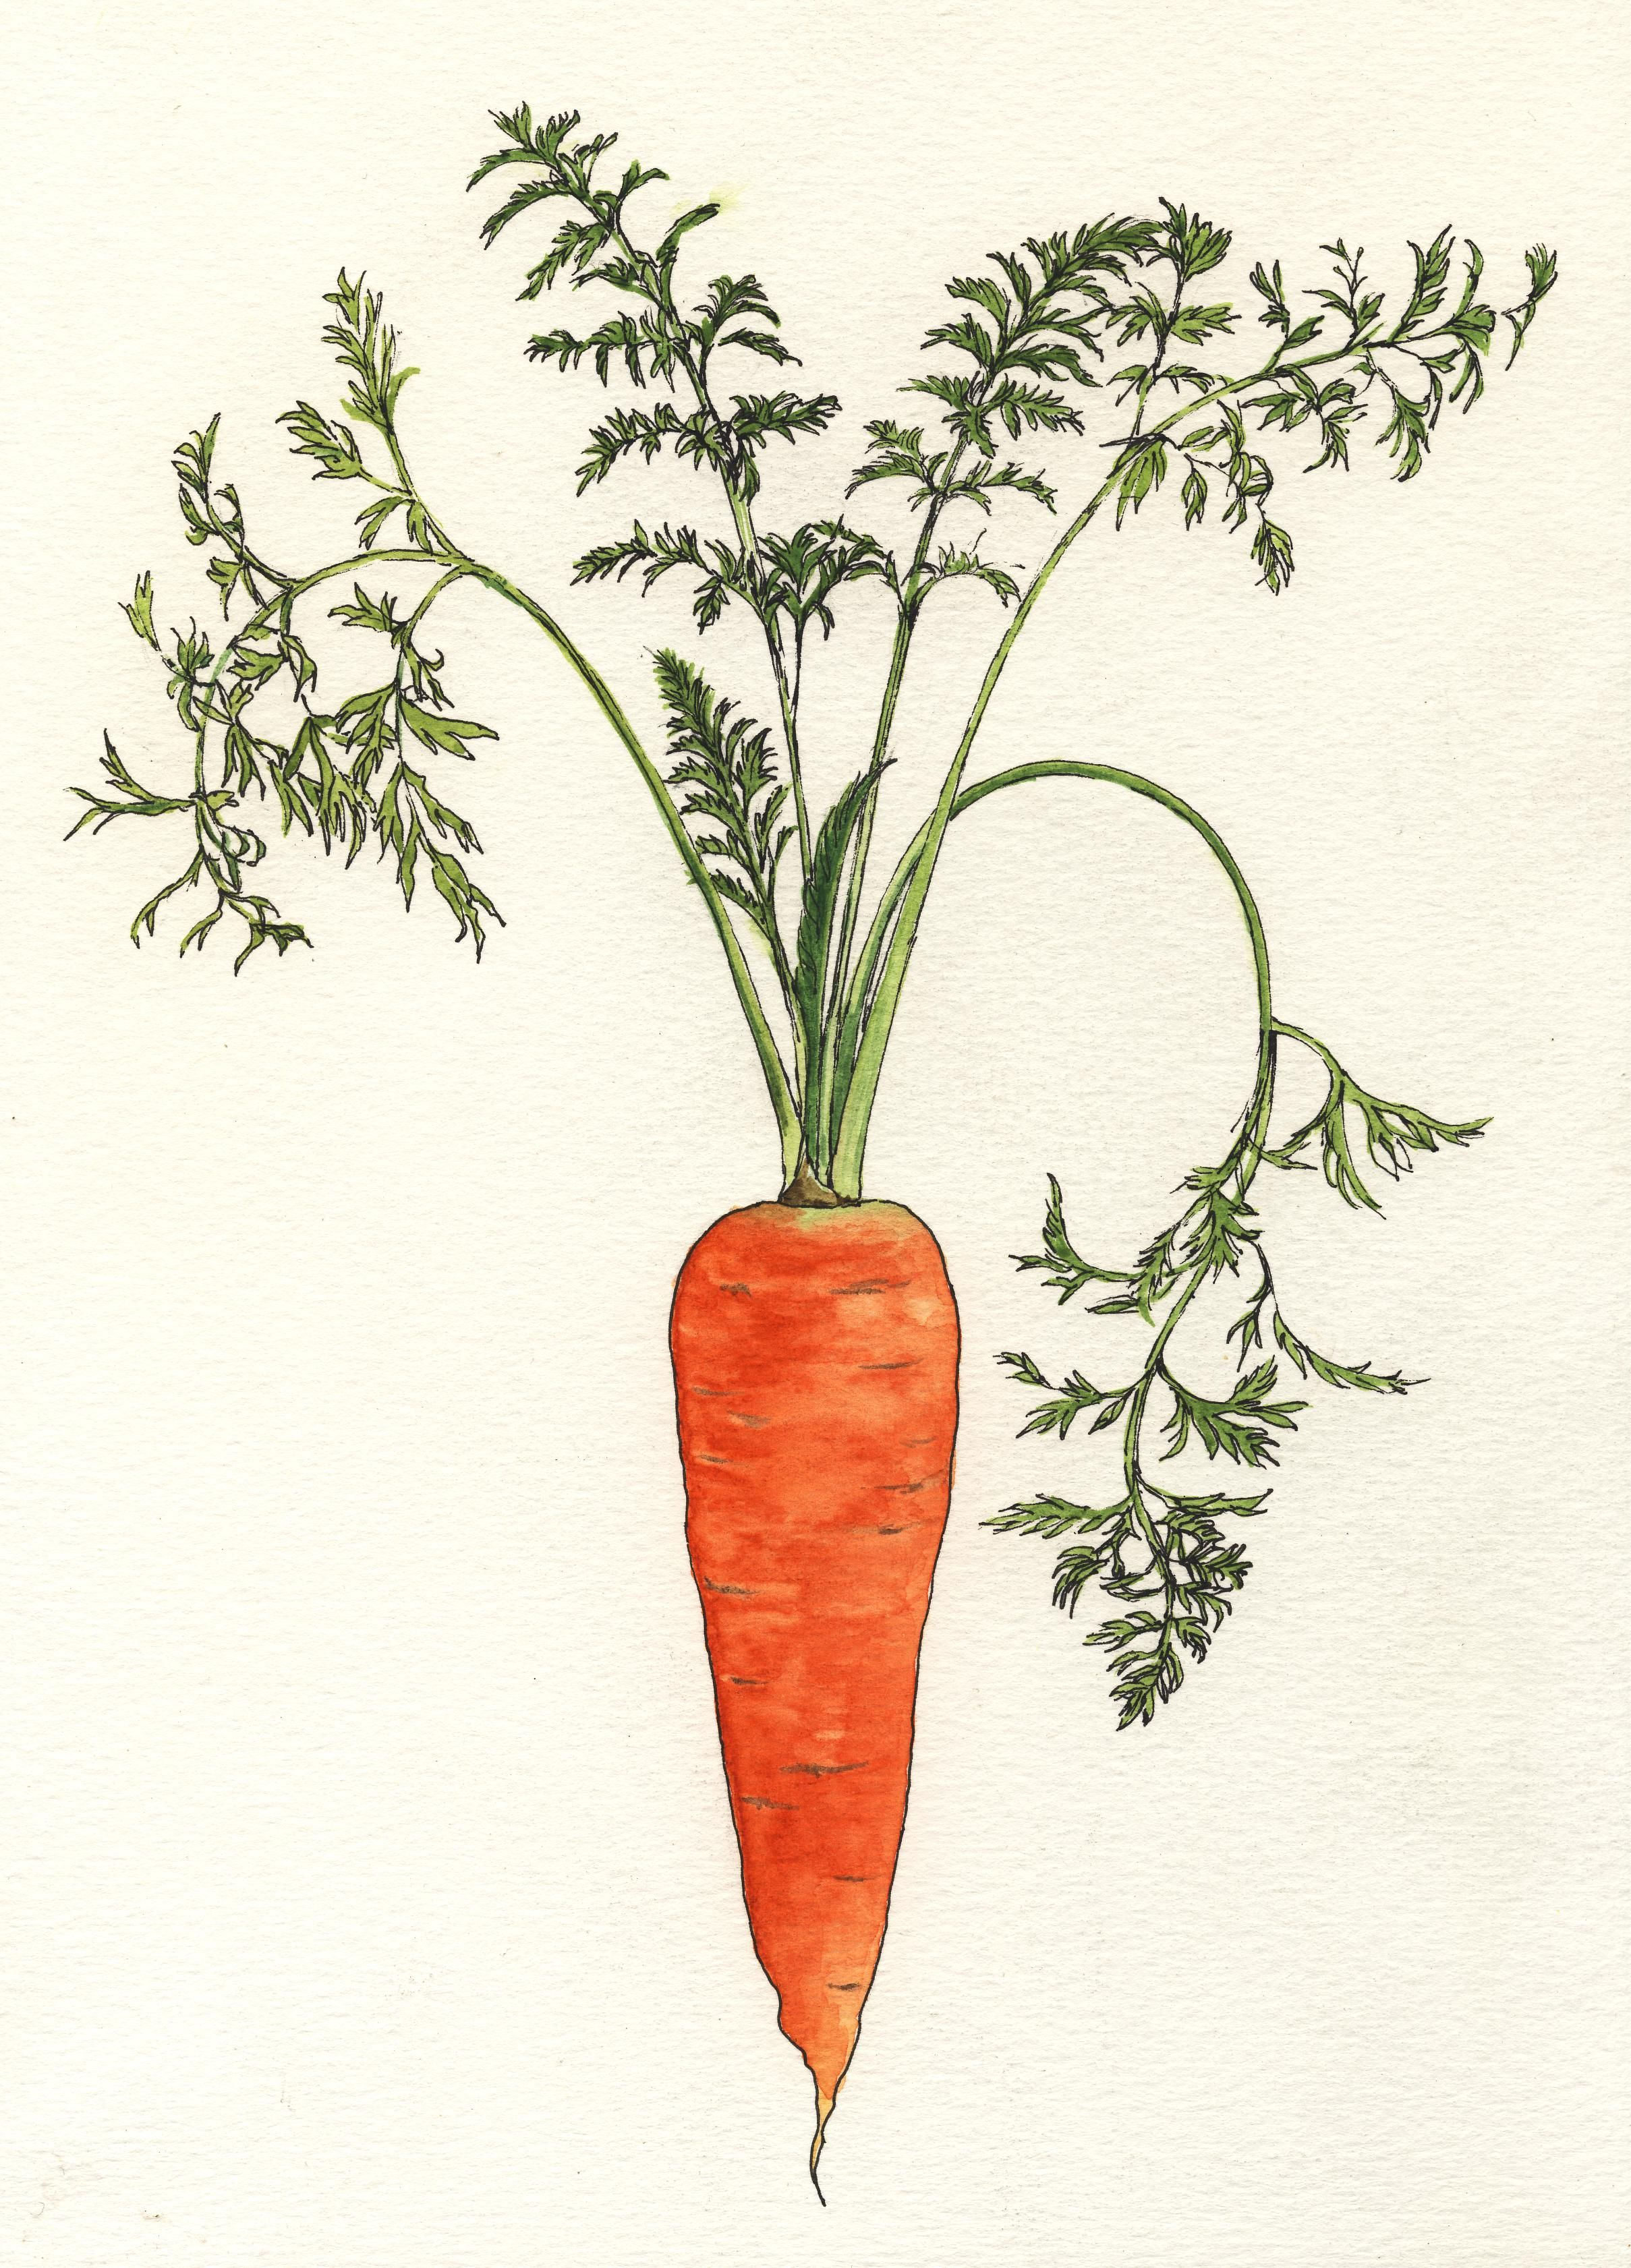 vintage science vegetable diagram - Google Search   Vintage ...